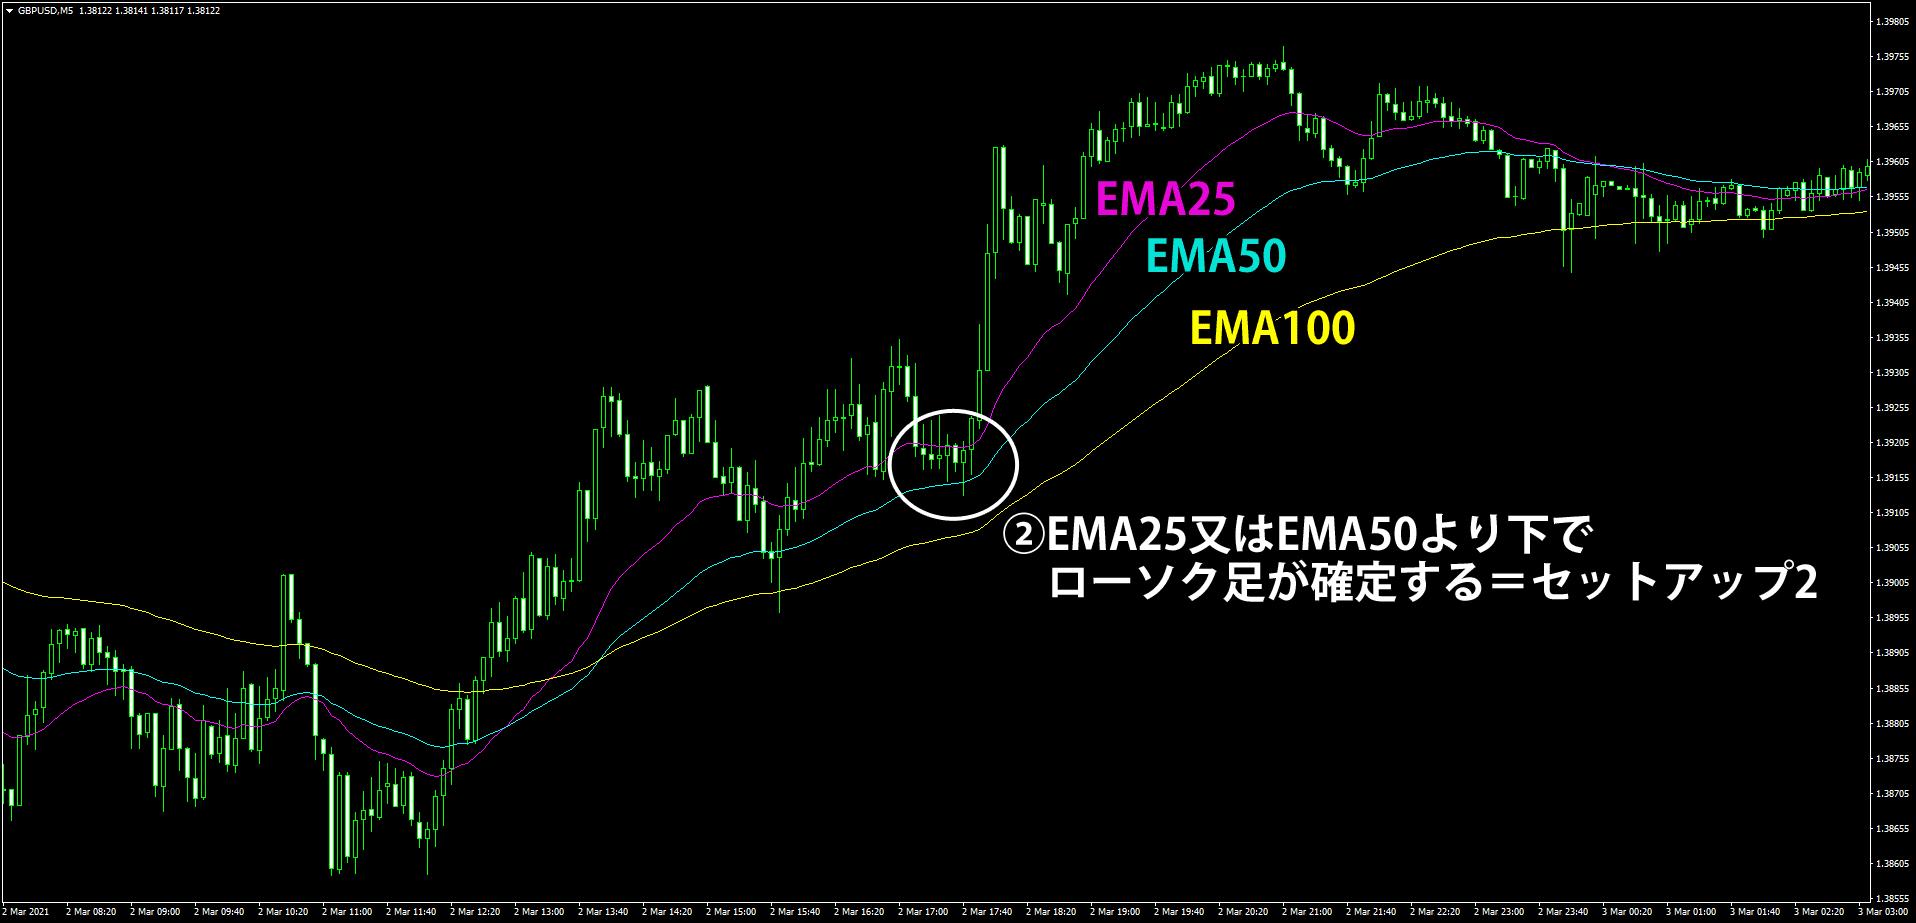 EMA3本を使う5分足スキャルピング手法の解説(セットアップ編2)